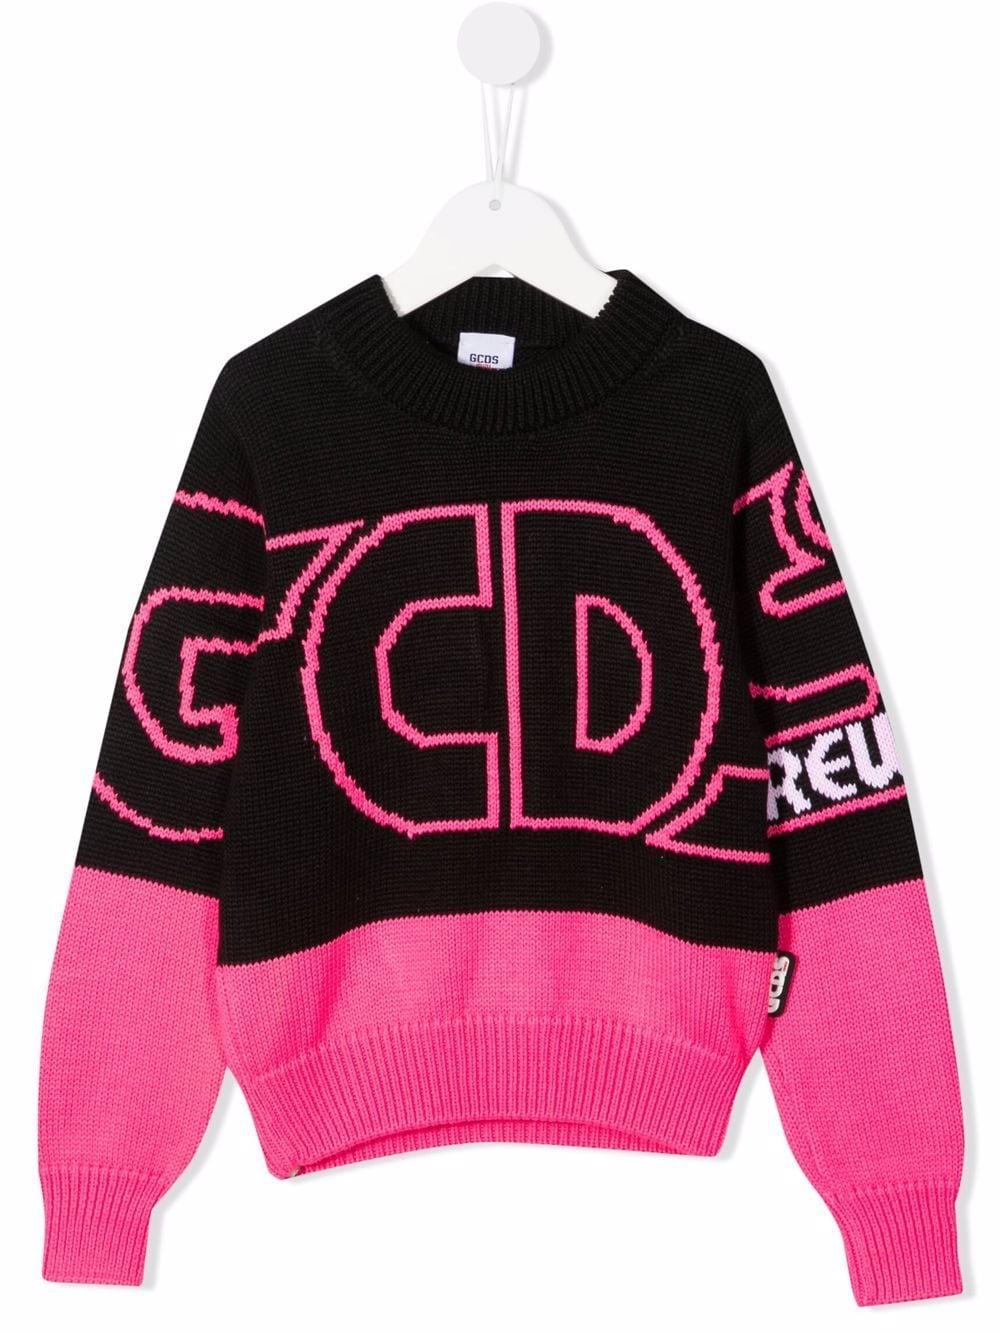 SWEATER GCDS KIDS | Hoodie | 028668110#